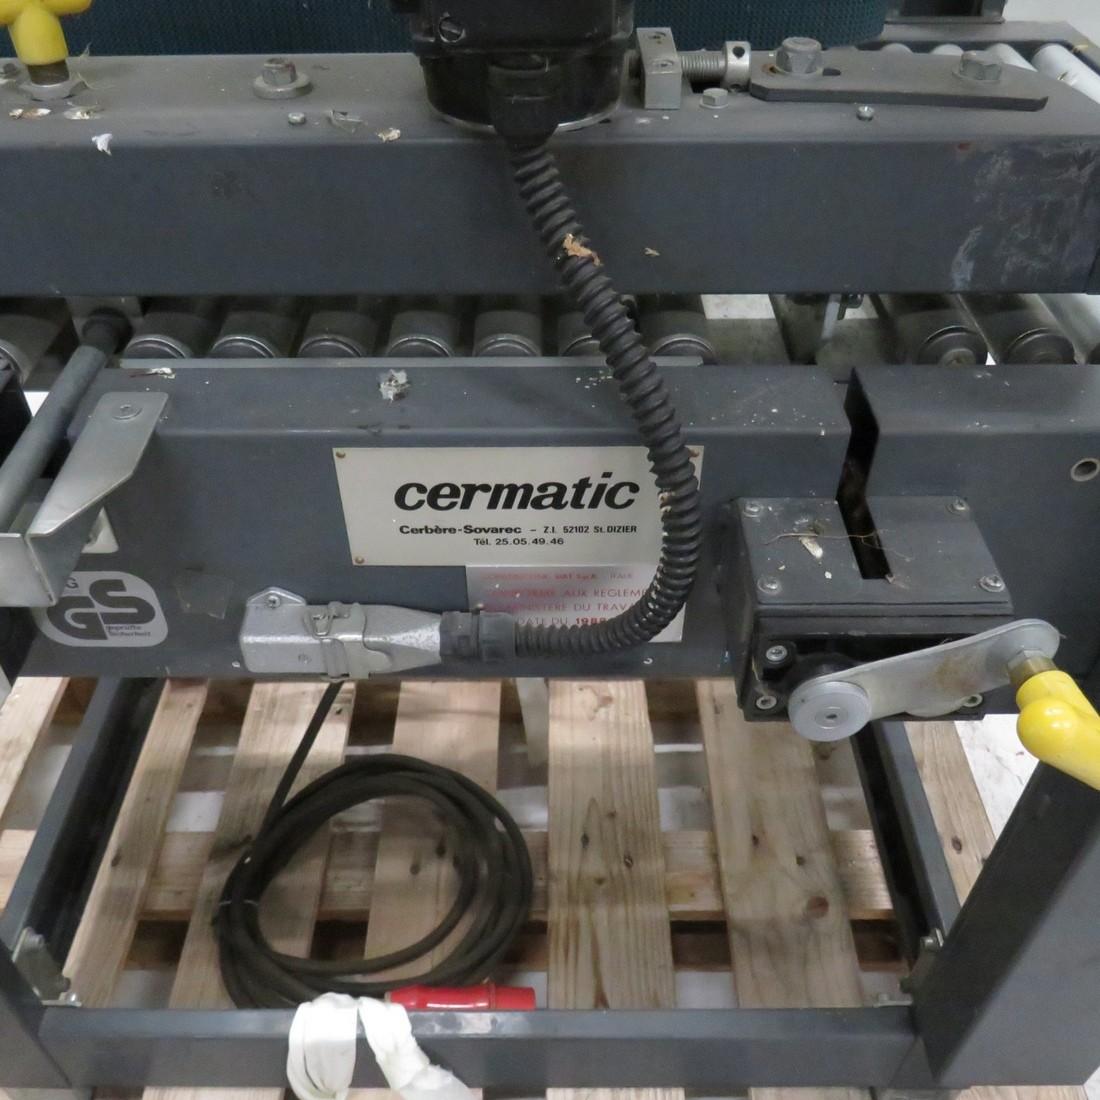 R11LS36 SIAT/CERMATIC taping machine